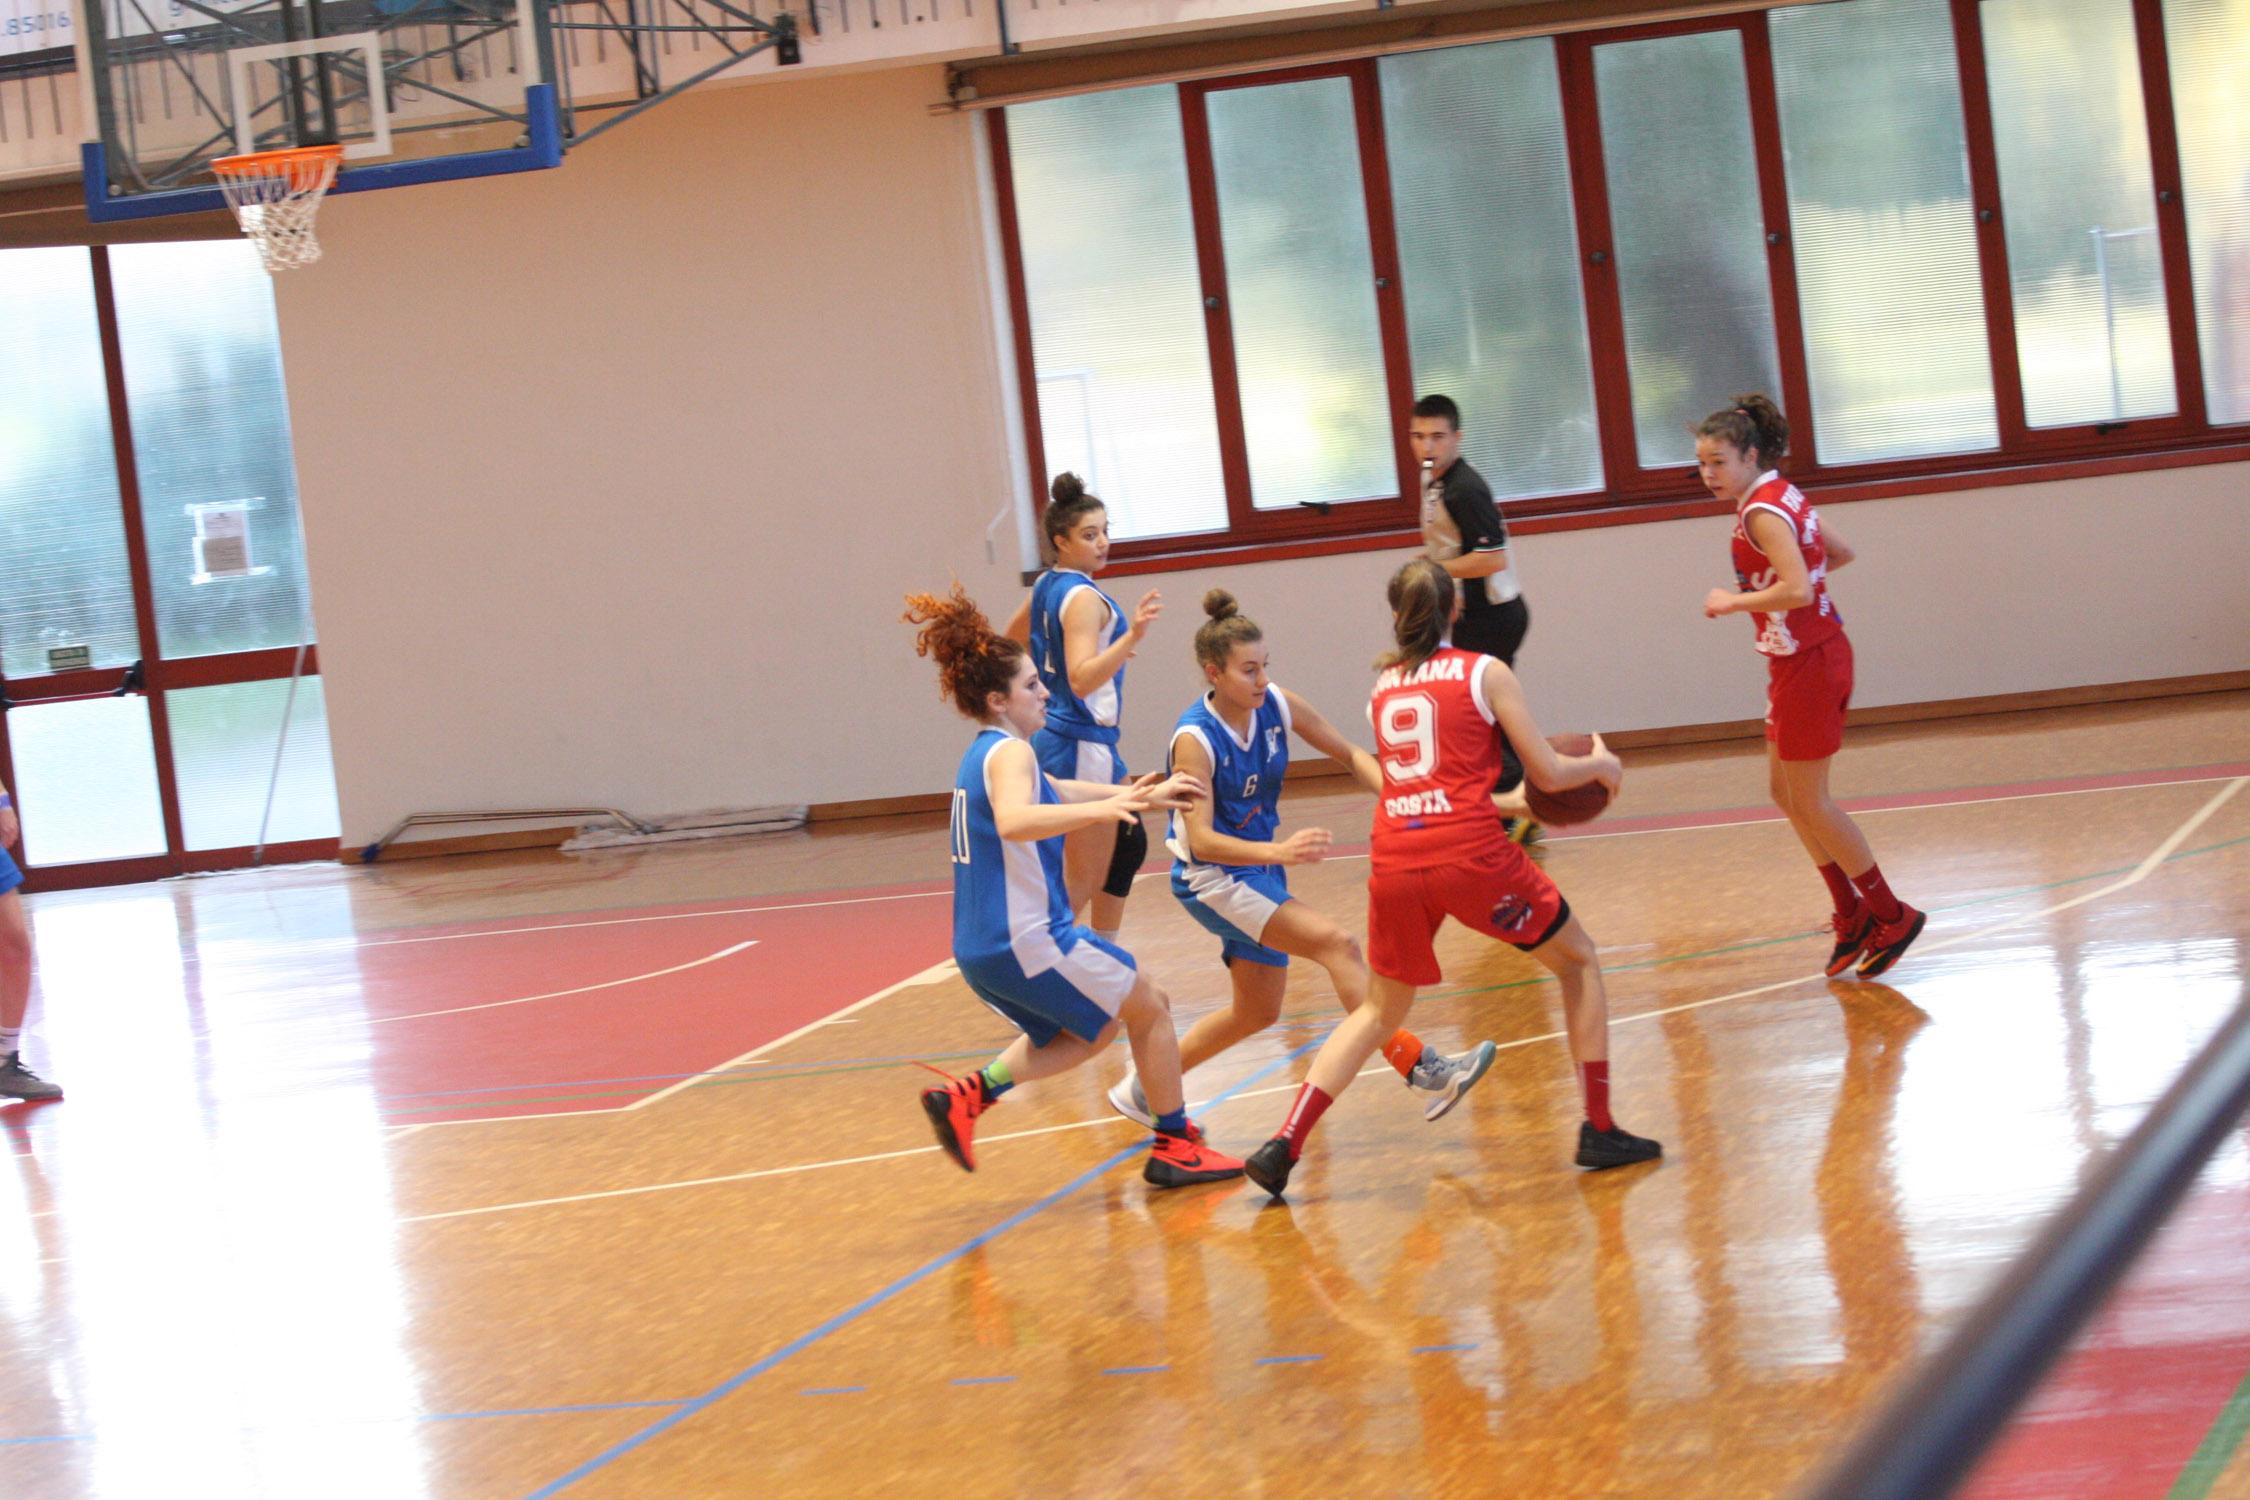 U16E - Costa Masnaga vs Baskettiamo Vittuone 2001 00004.jpg